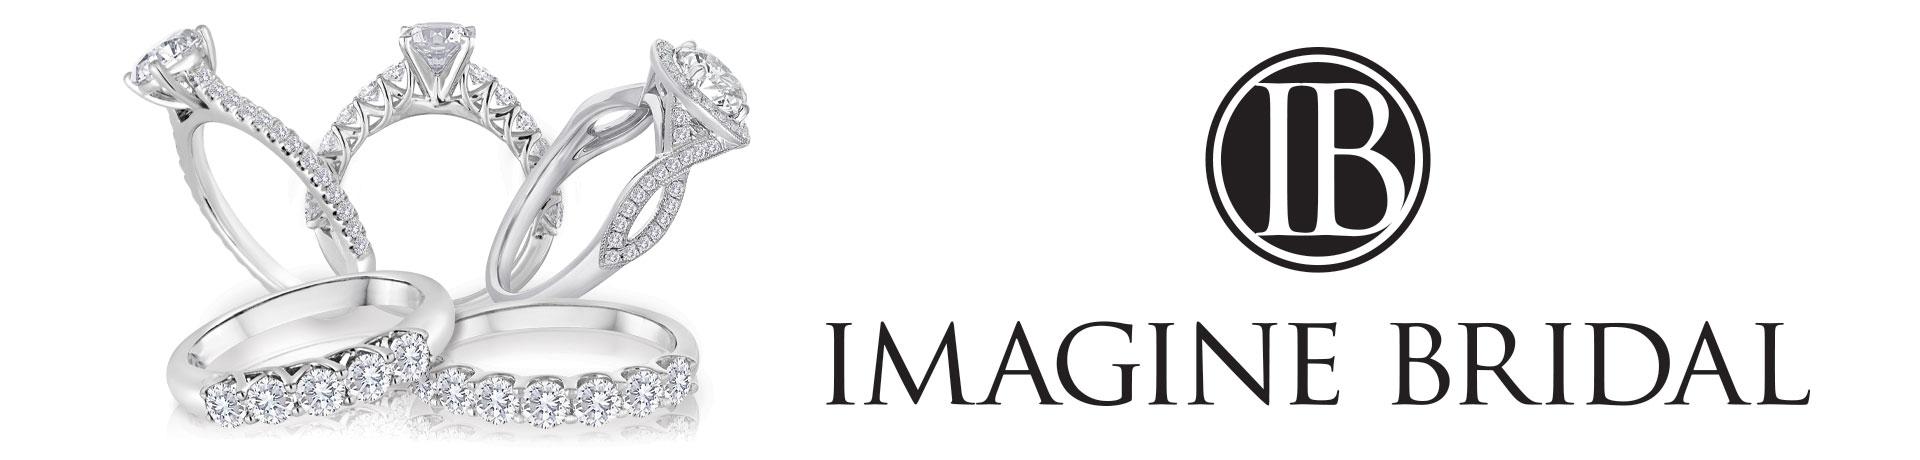 Imagine-Bridal